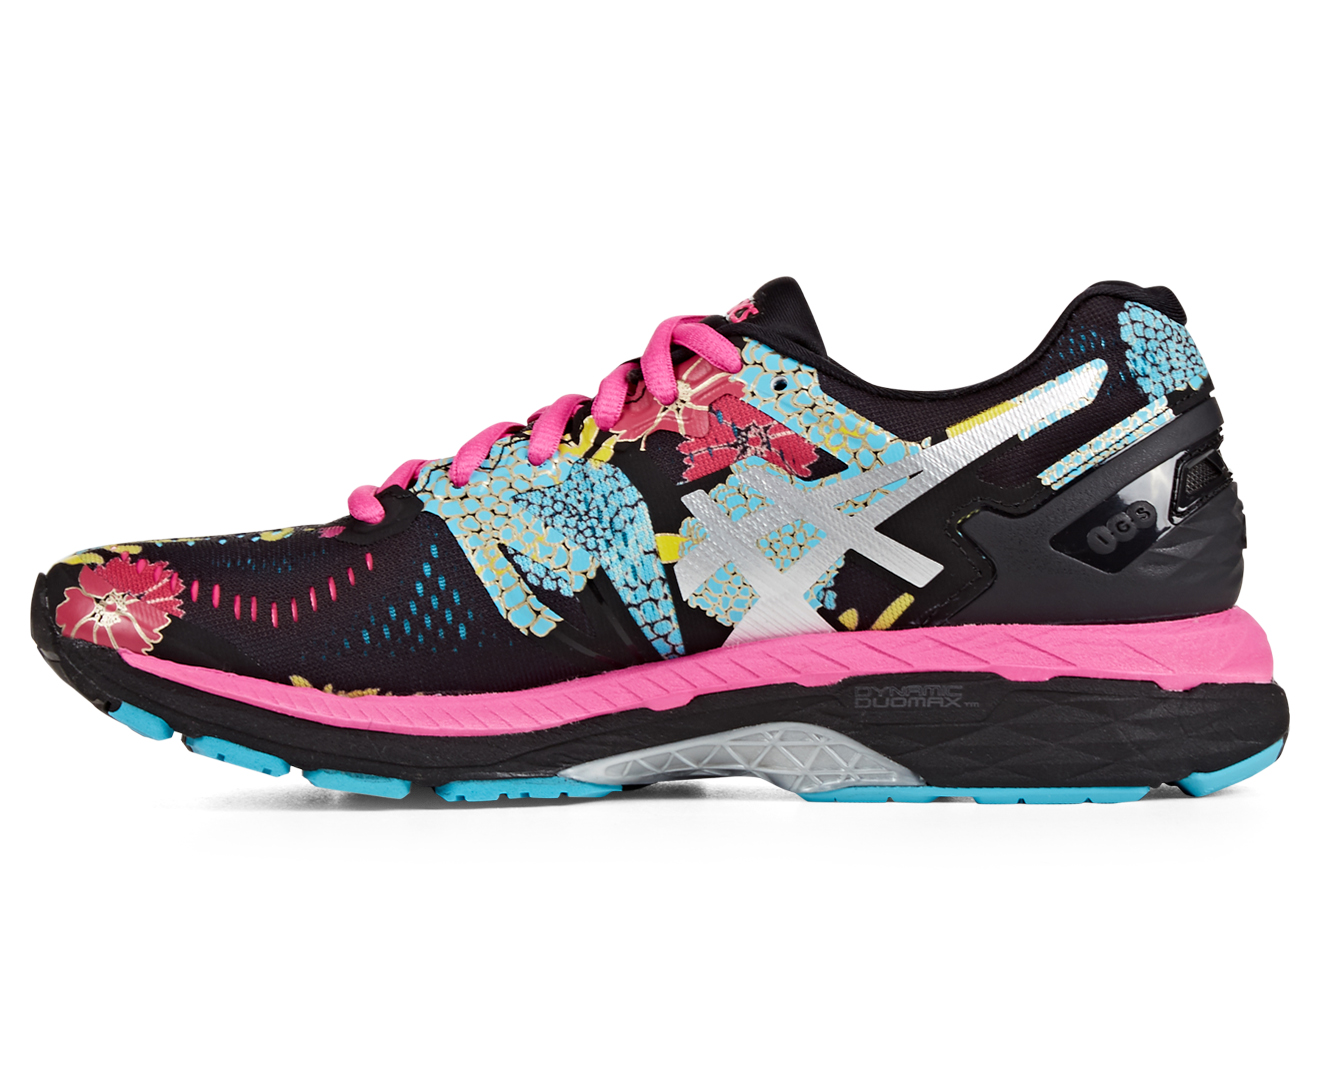 c26a93cef2f6 ASICS Women s GEL-Kayano 23 Shoe - Black Silver Pink Glow